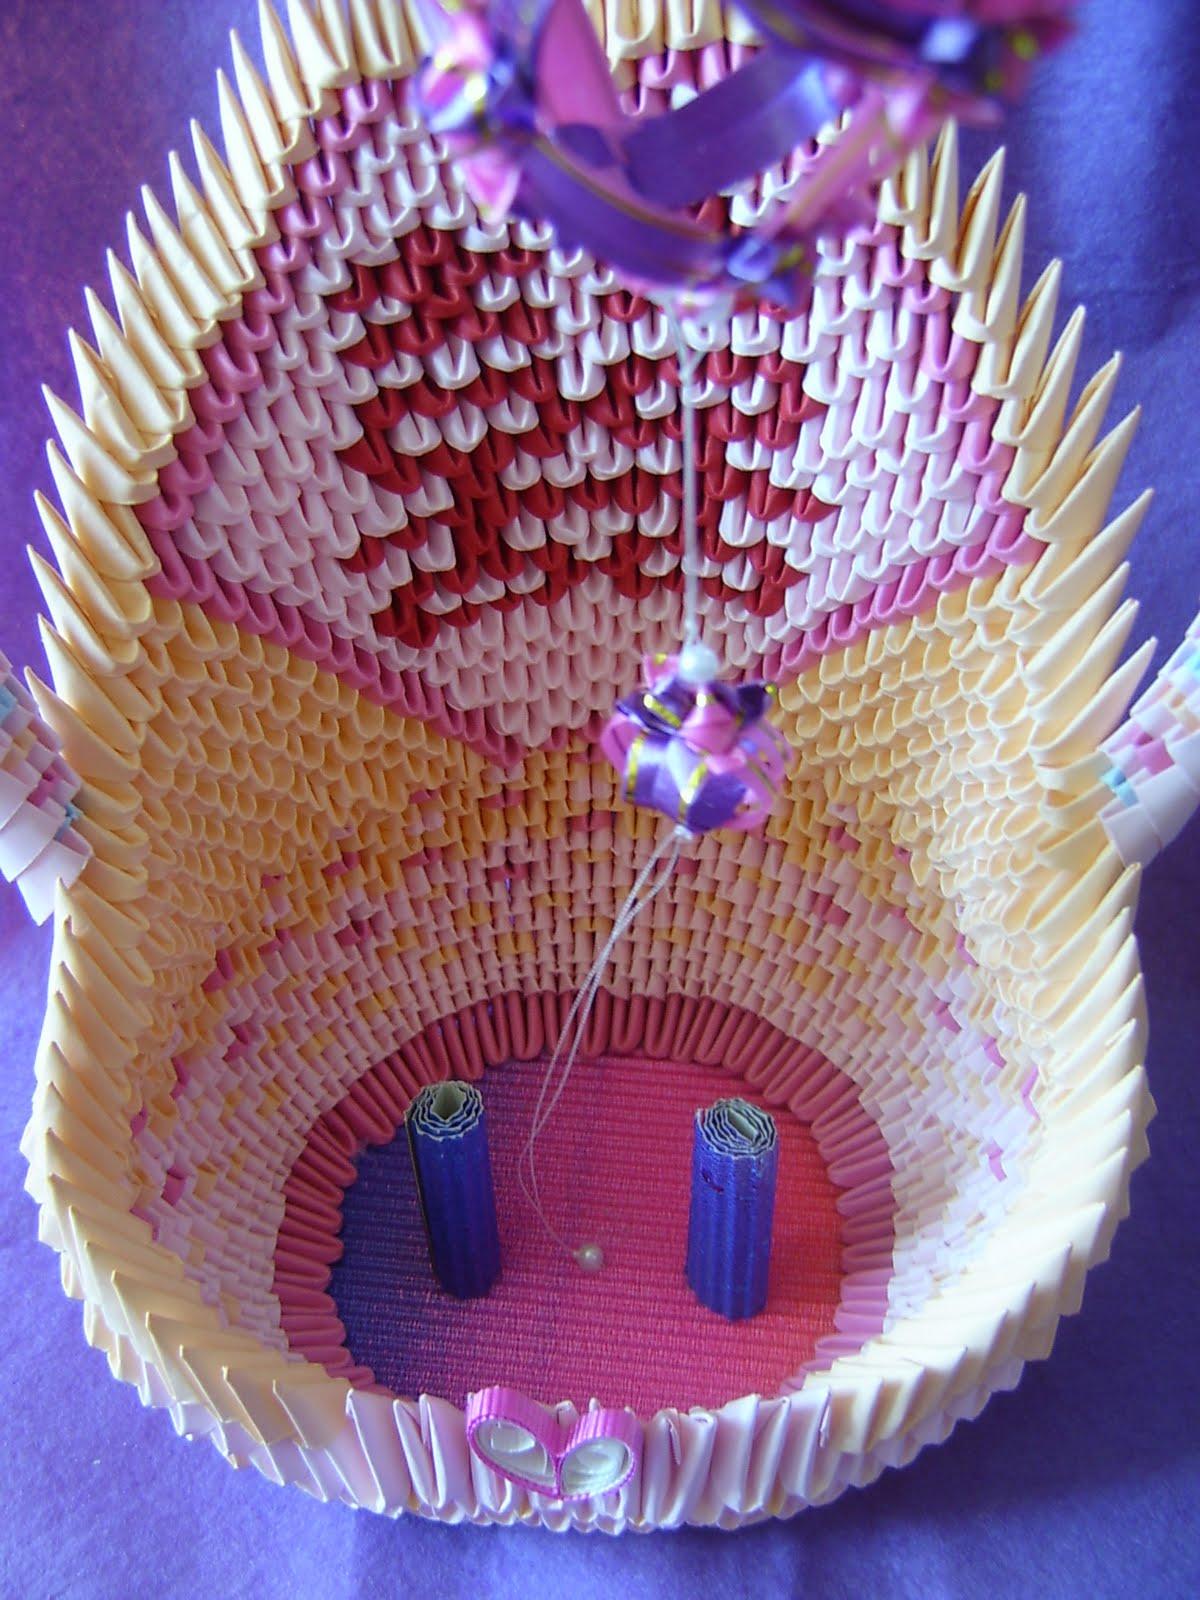 Jewellia handicrafts my new design 3d origami wedding ornament jewellia handicrafts jeuxipadfo Images